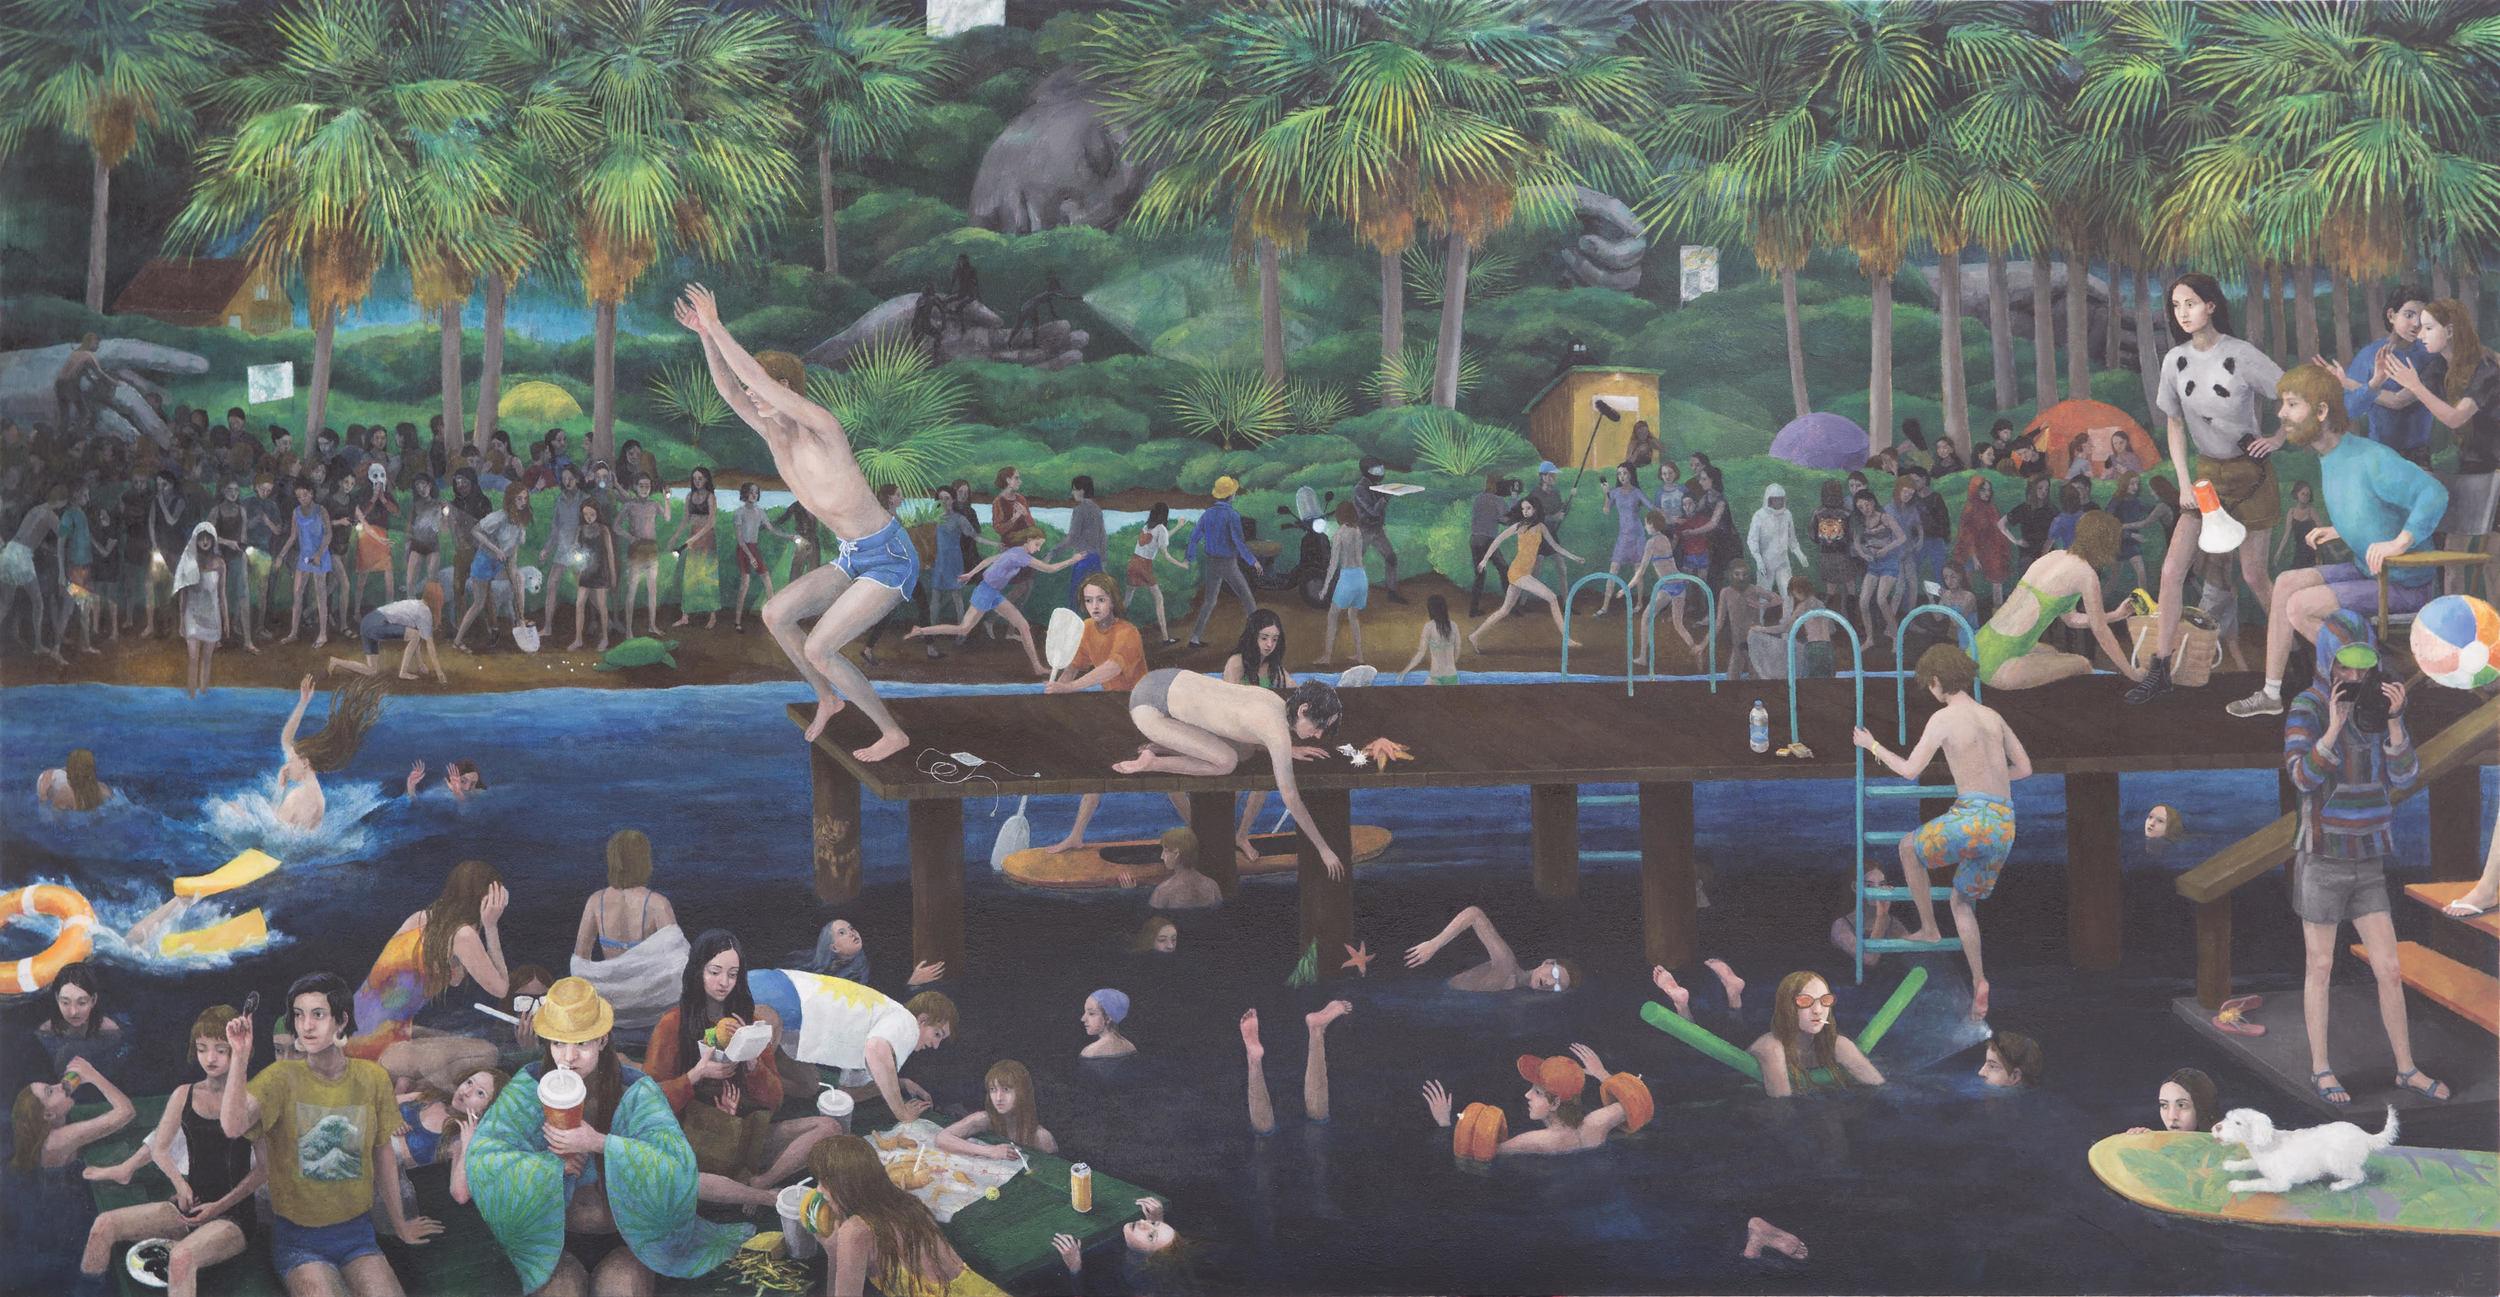 Oil on canvas, 120x230cm